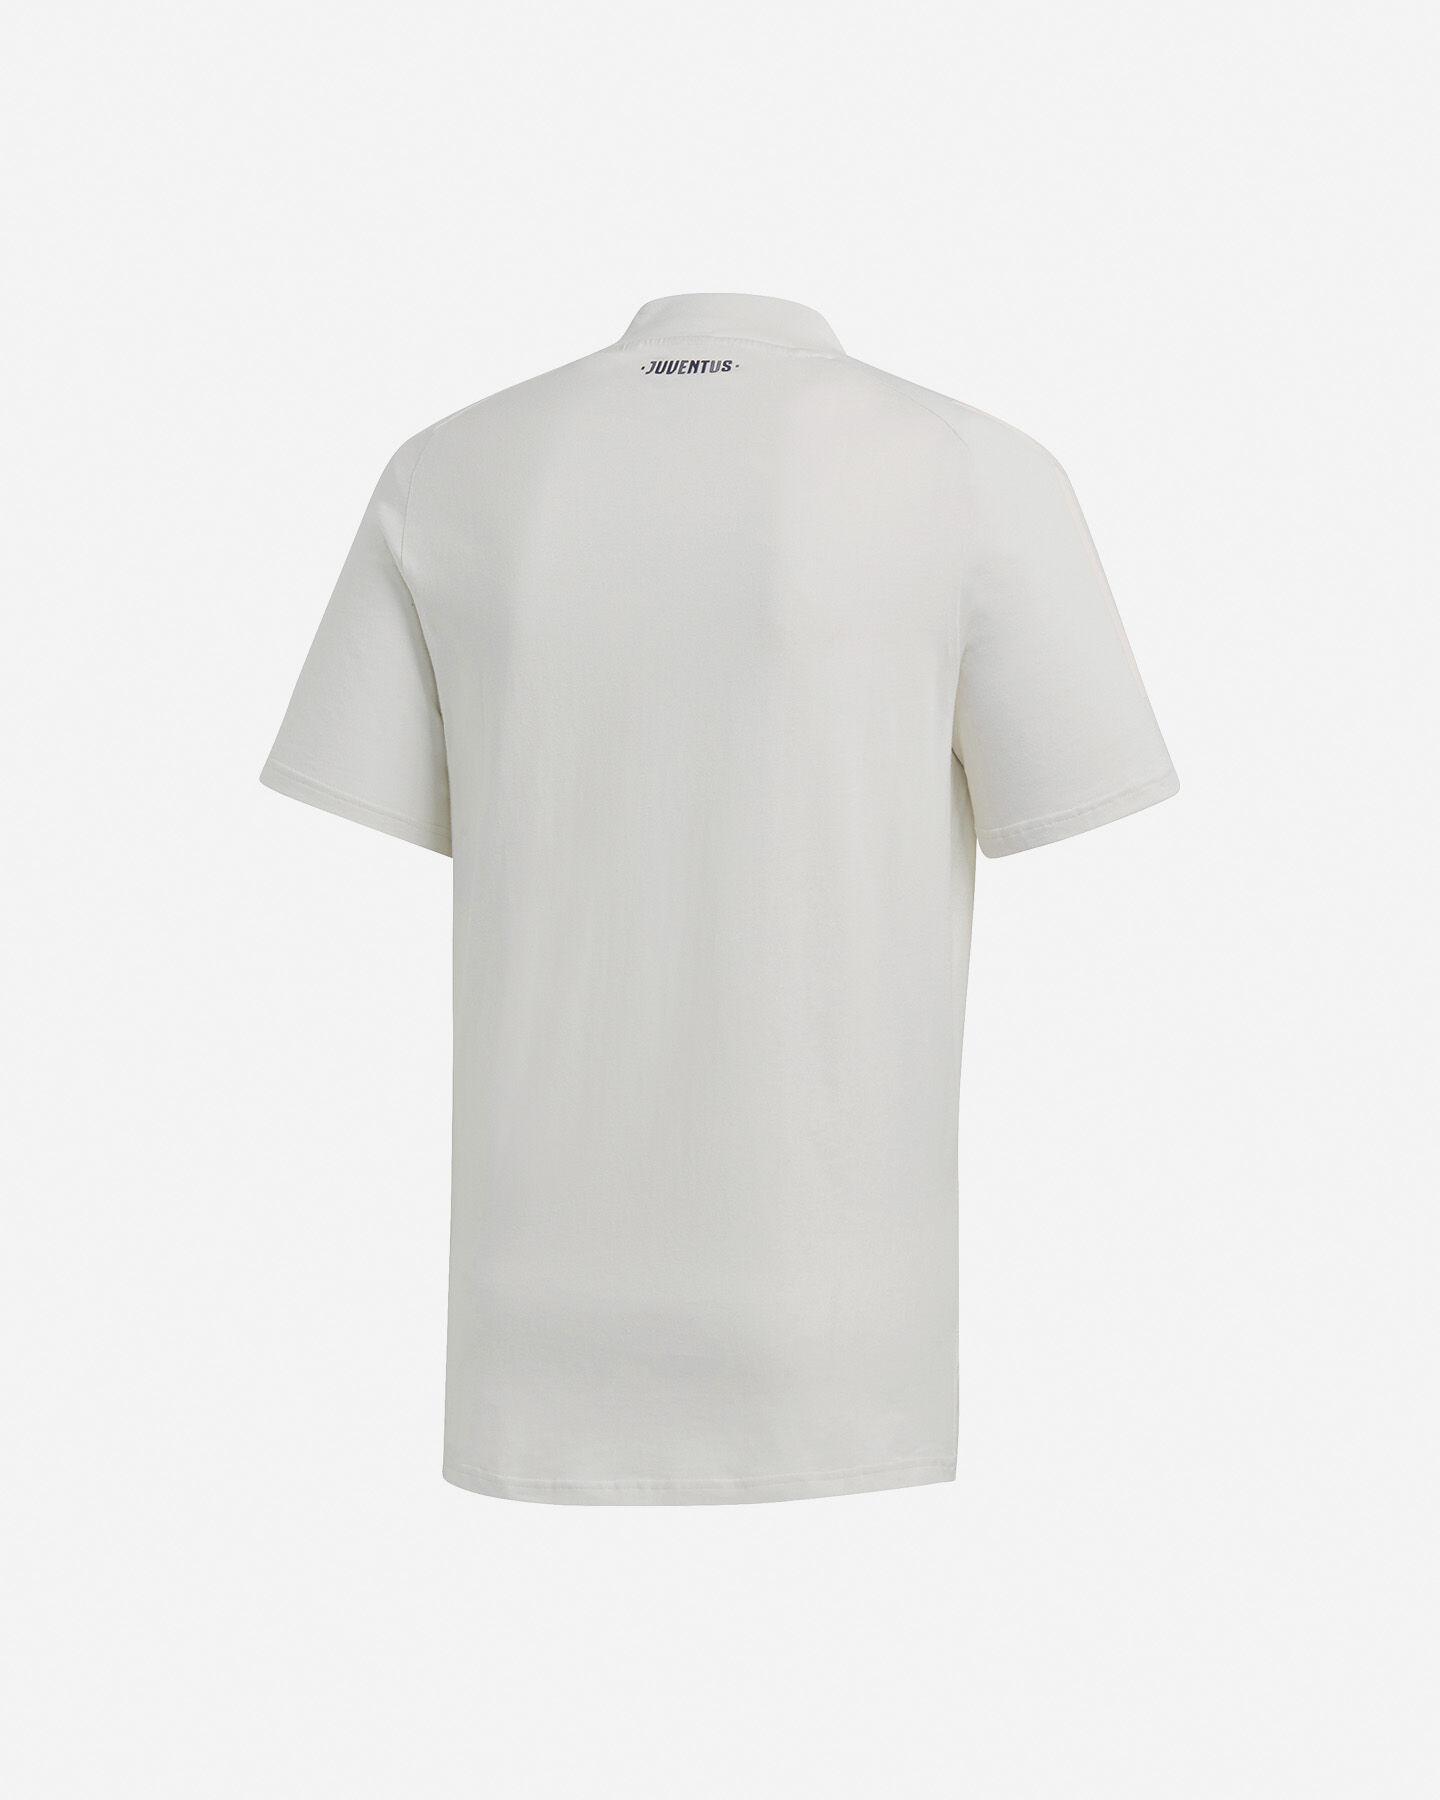 Abbigliamento calcio ADIDAS JUVENTUS 20-21 M S5217518 scatto 1